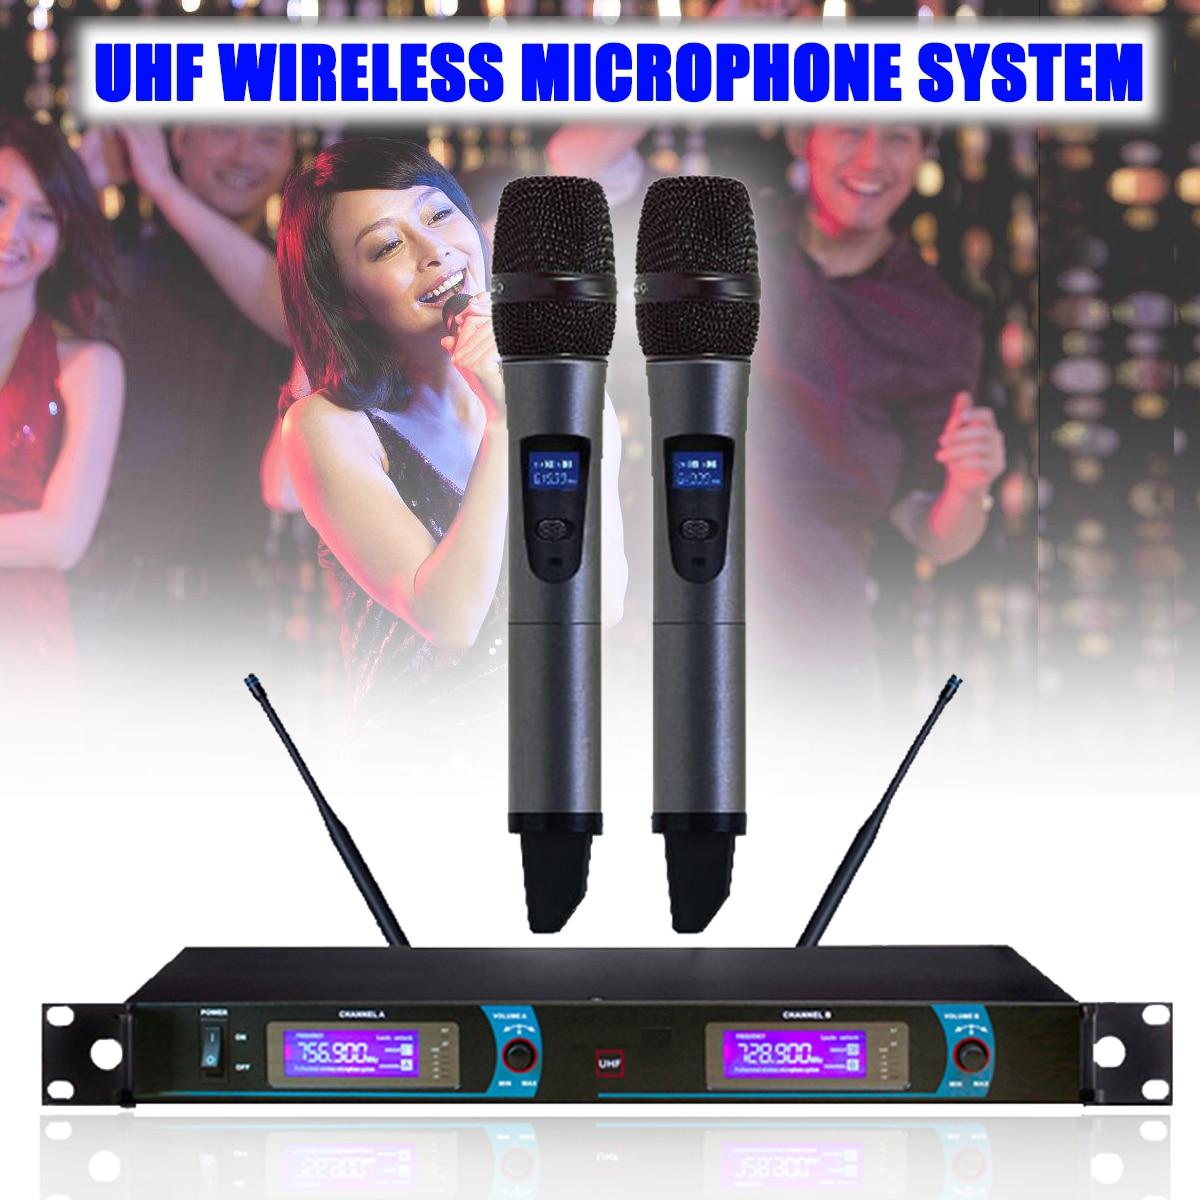 LCD Display UHF Wireless Dual Studio Microphone Mic System Home KTV Karaoke DJ Wireless Microphone Profesional for Computer